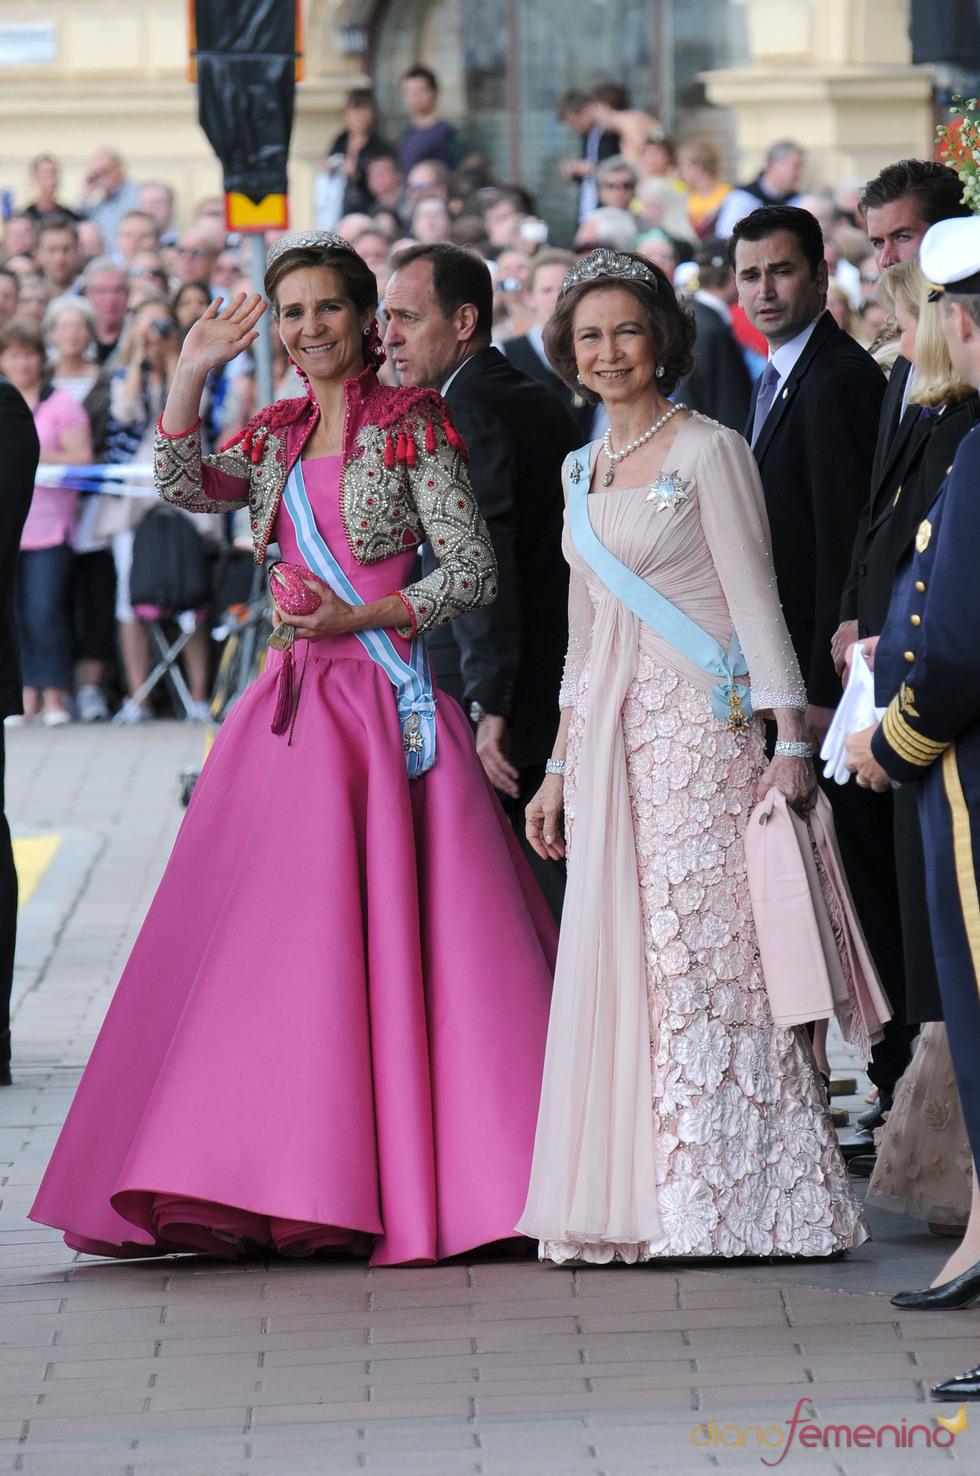 Contemporáneo Vestido De Boda Real Inspiración - Colección de ...